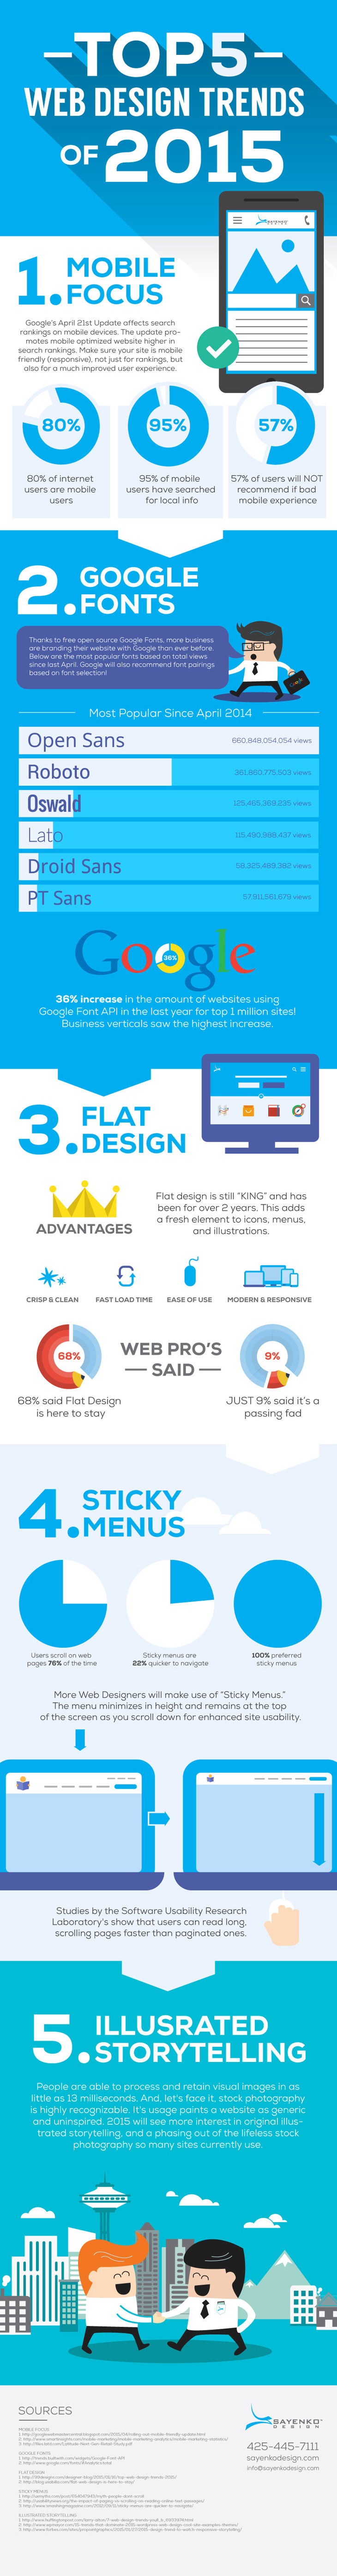 retrospective webdesign 2015 730